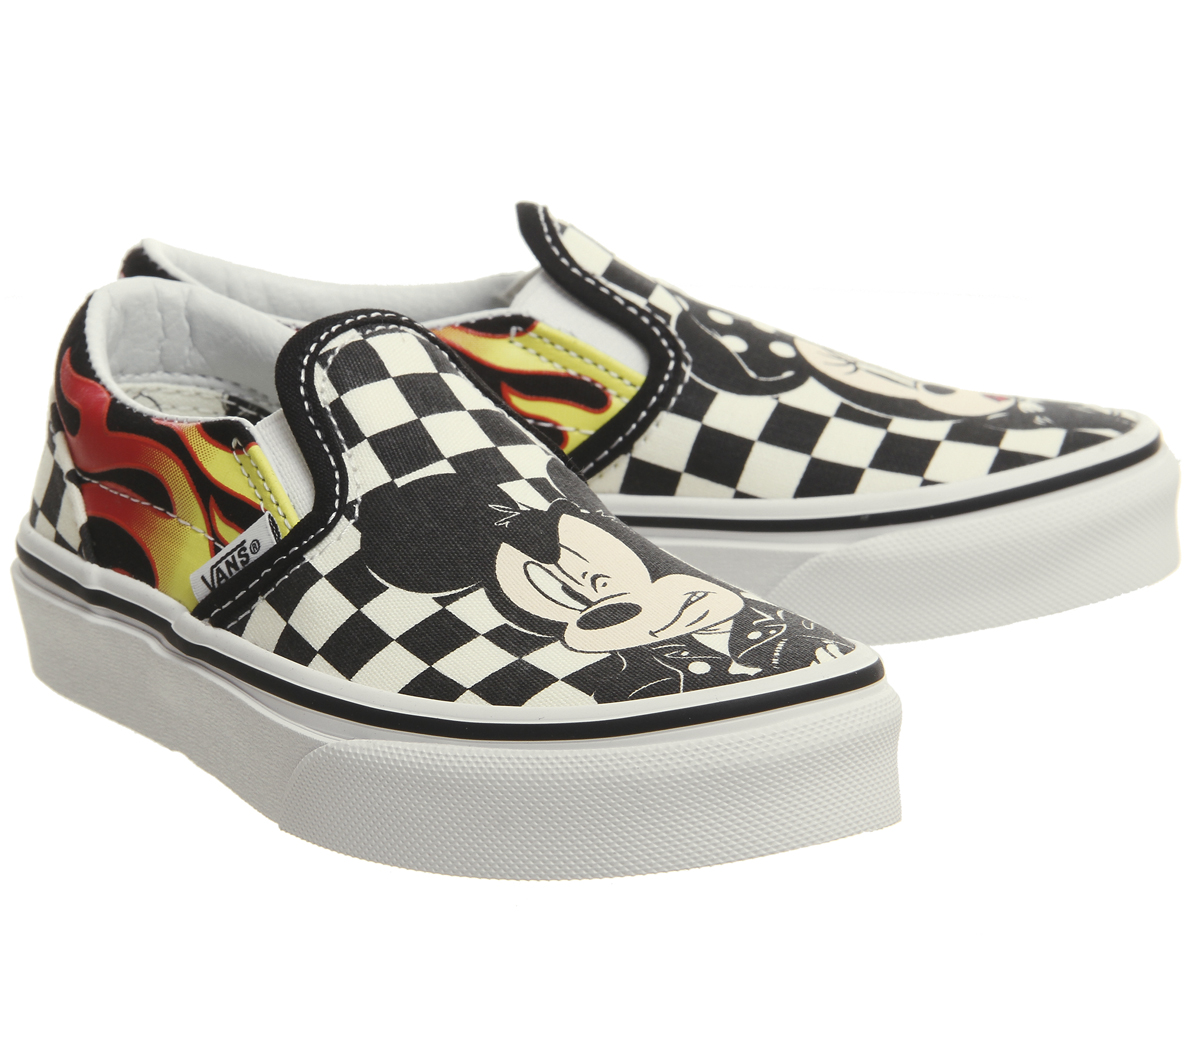 b2fe573a39910c Kids Vans Classic Slip On Kids Trainers Mickey And Minnie Checker ...